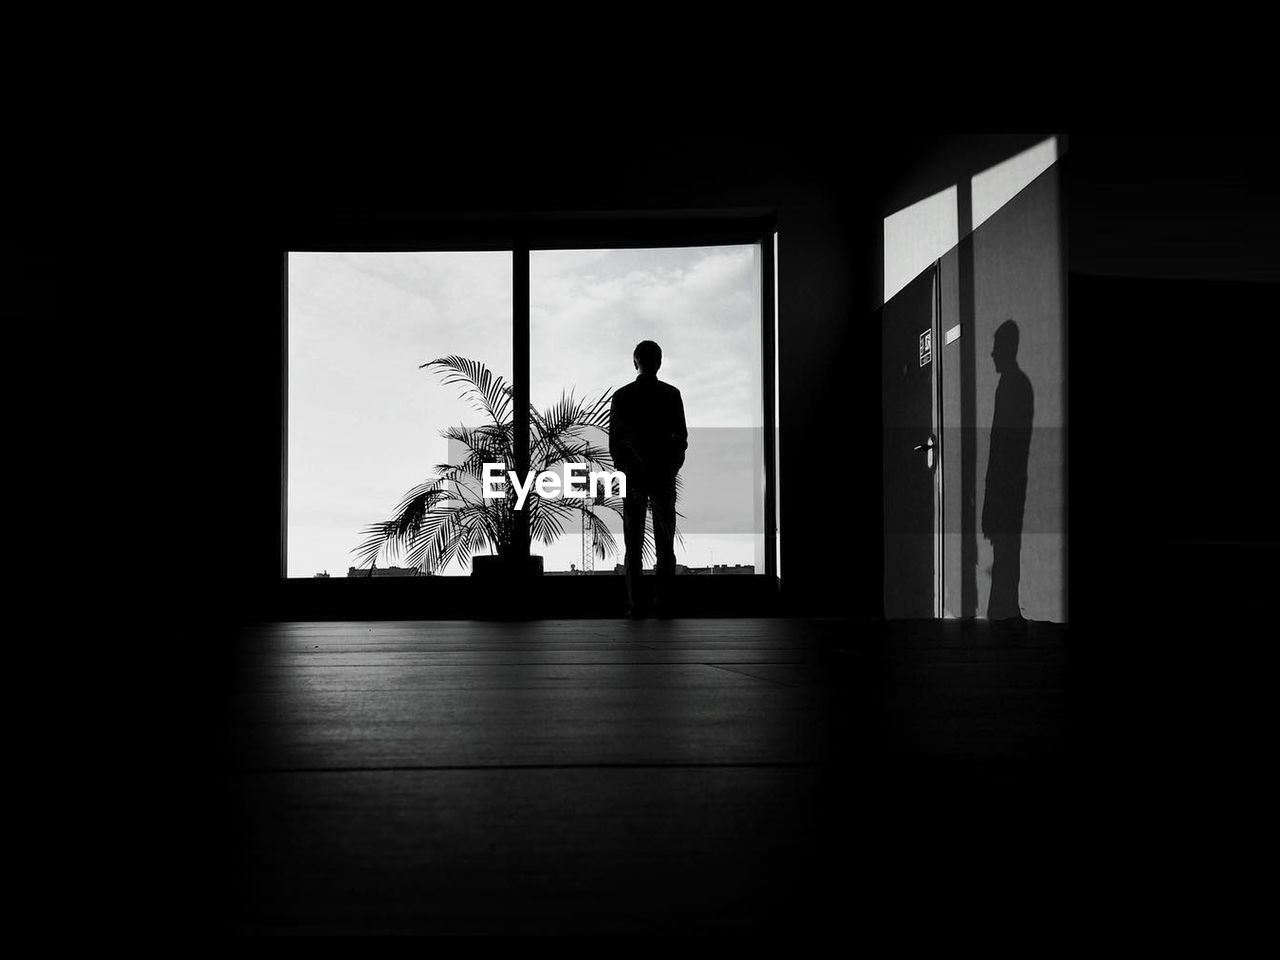 Silhouette man standing on floor against window